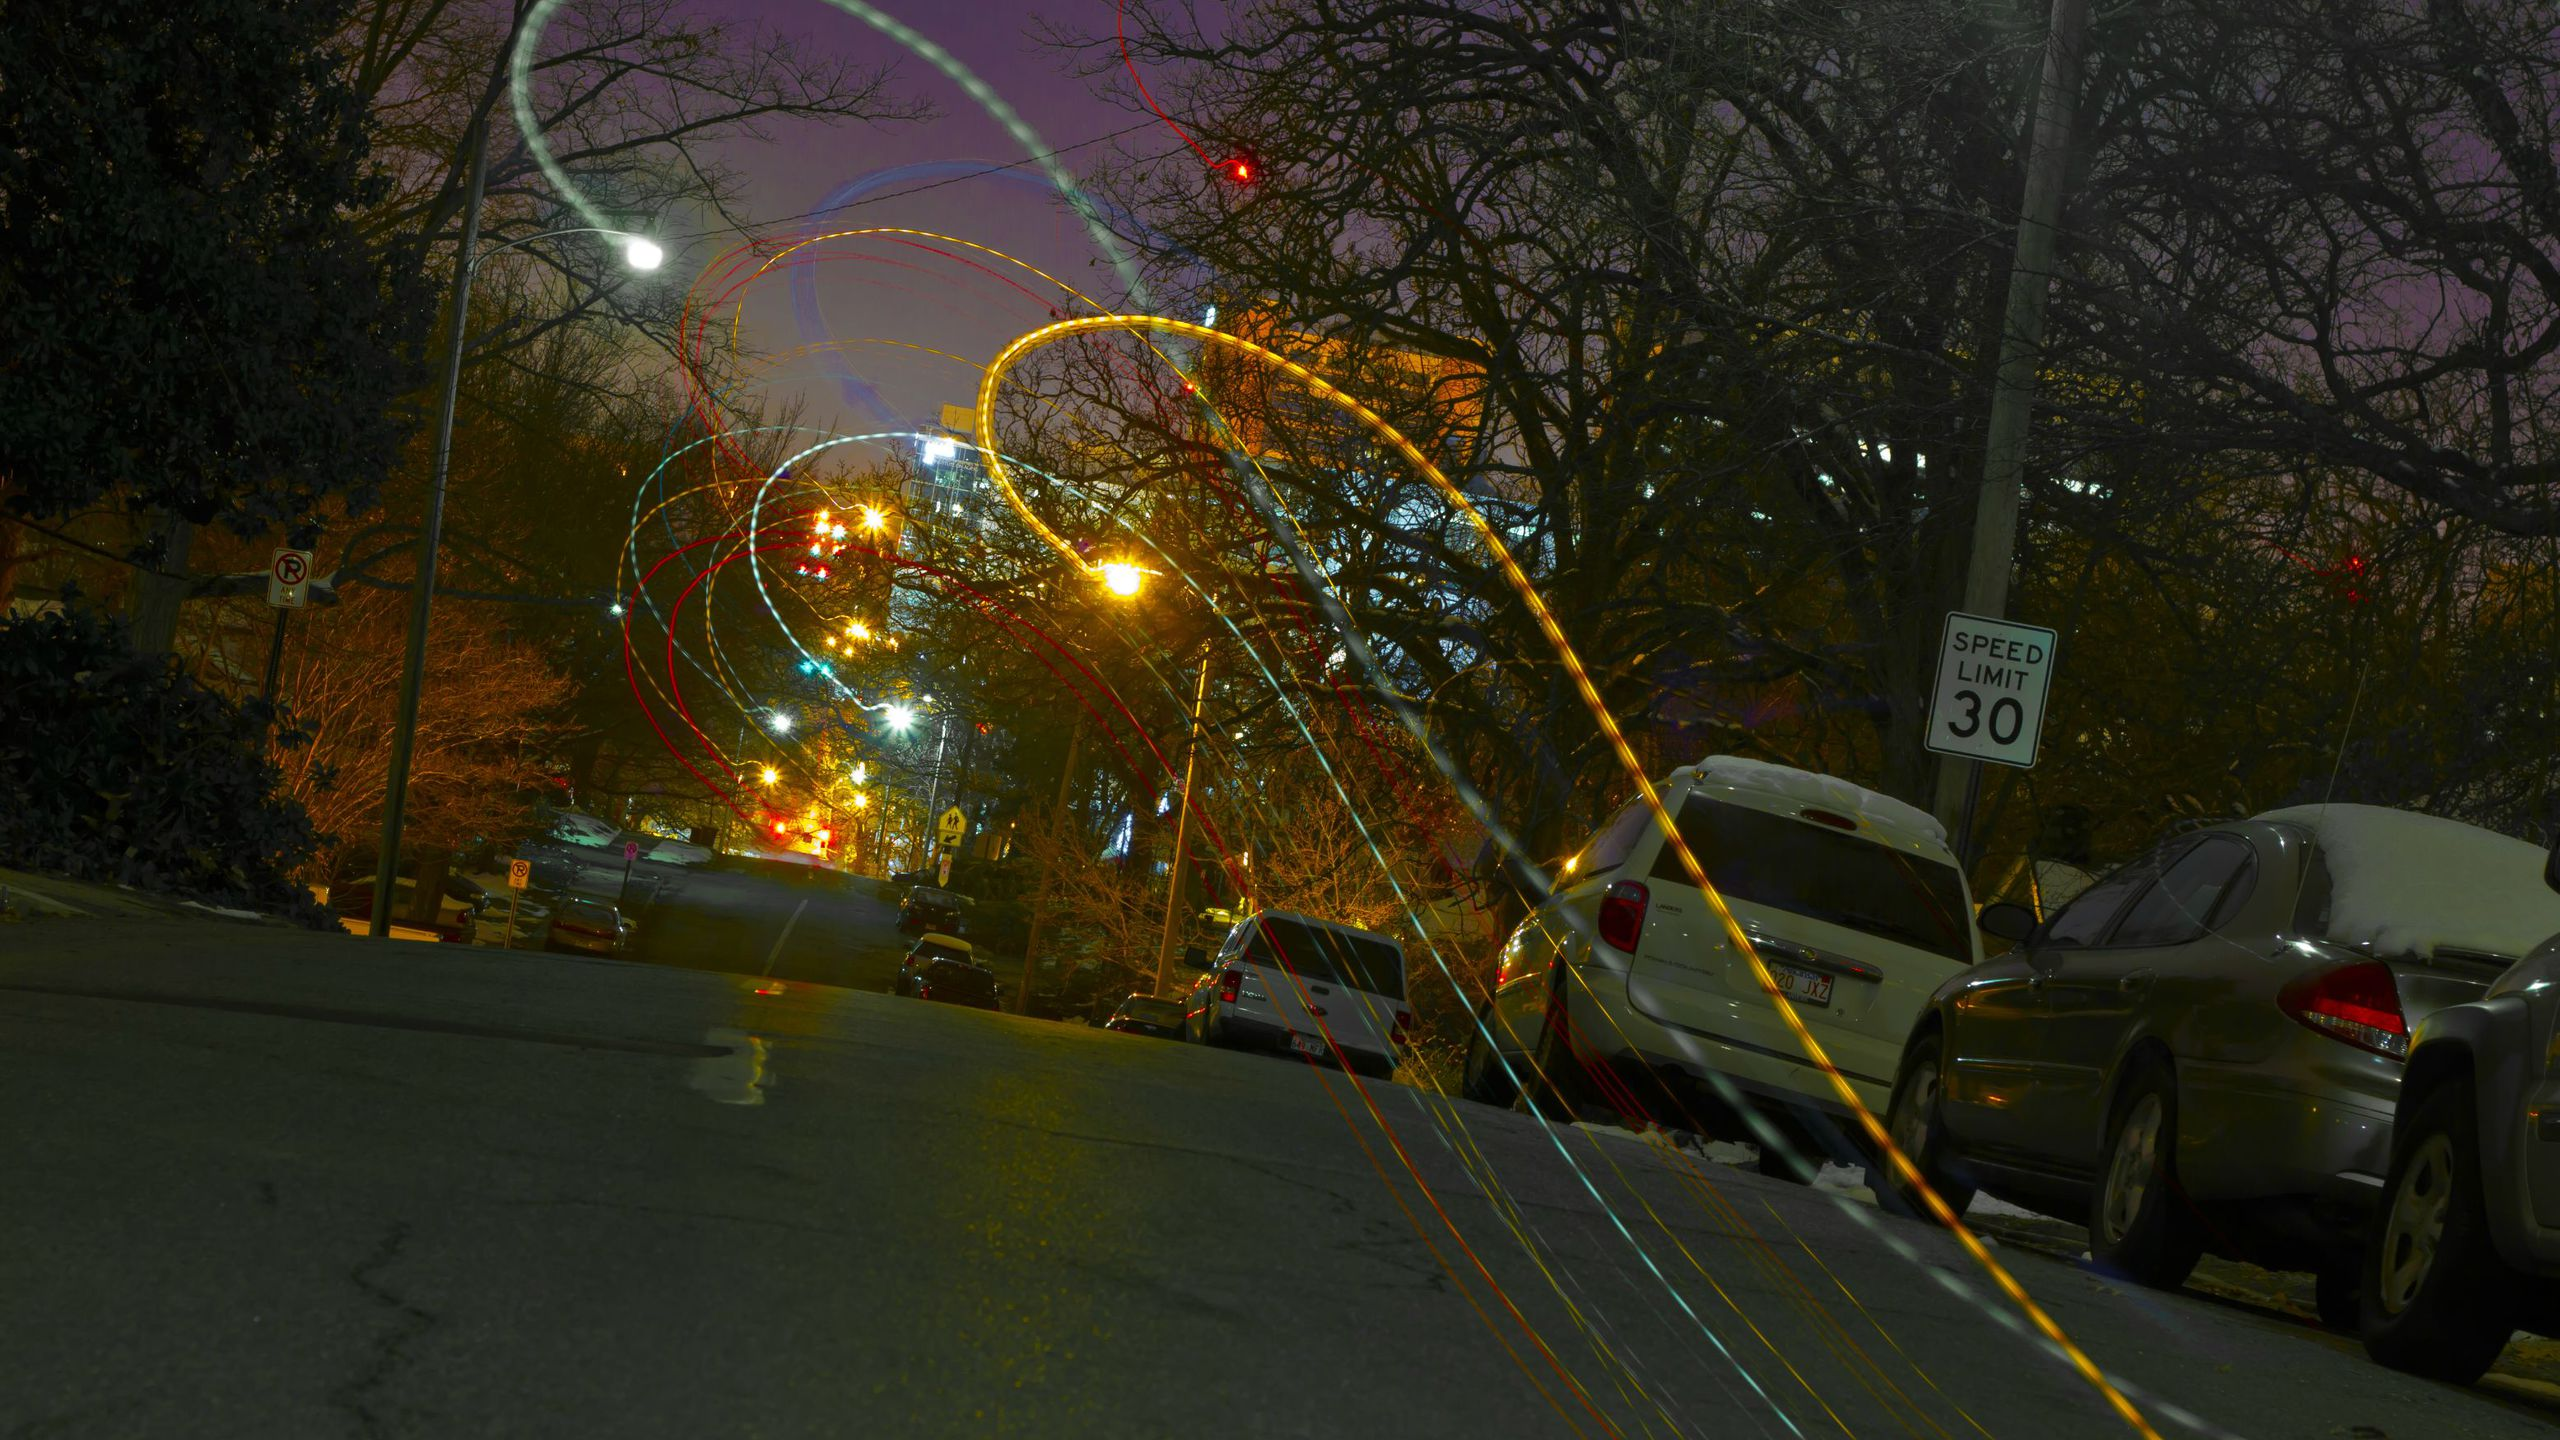 BOTPOST] Accidents can turn out pretty cool iimgurcom 2560x1440